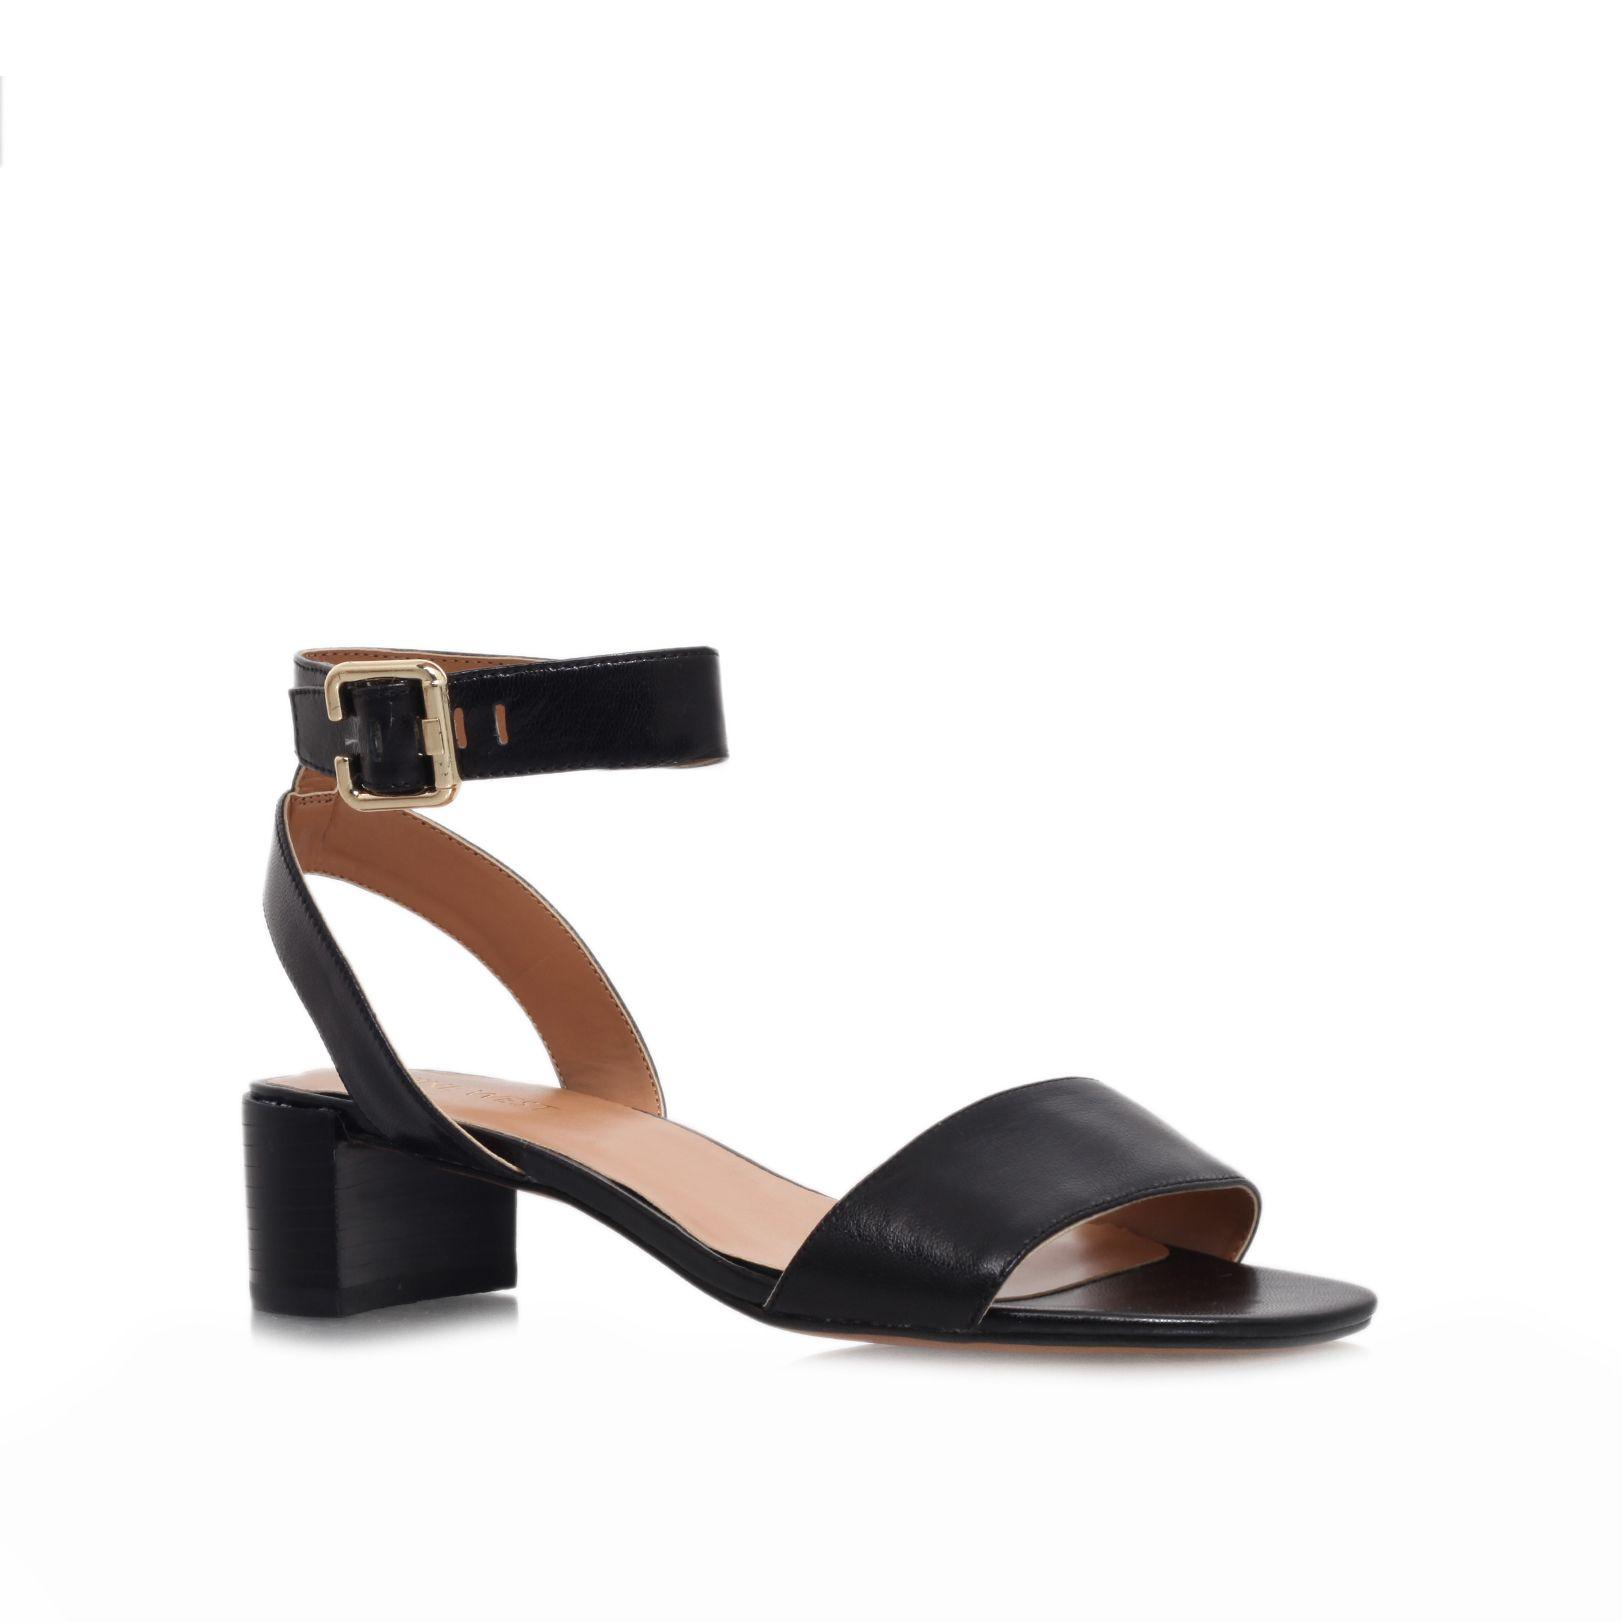 Black sandals with heels - Gallery